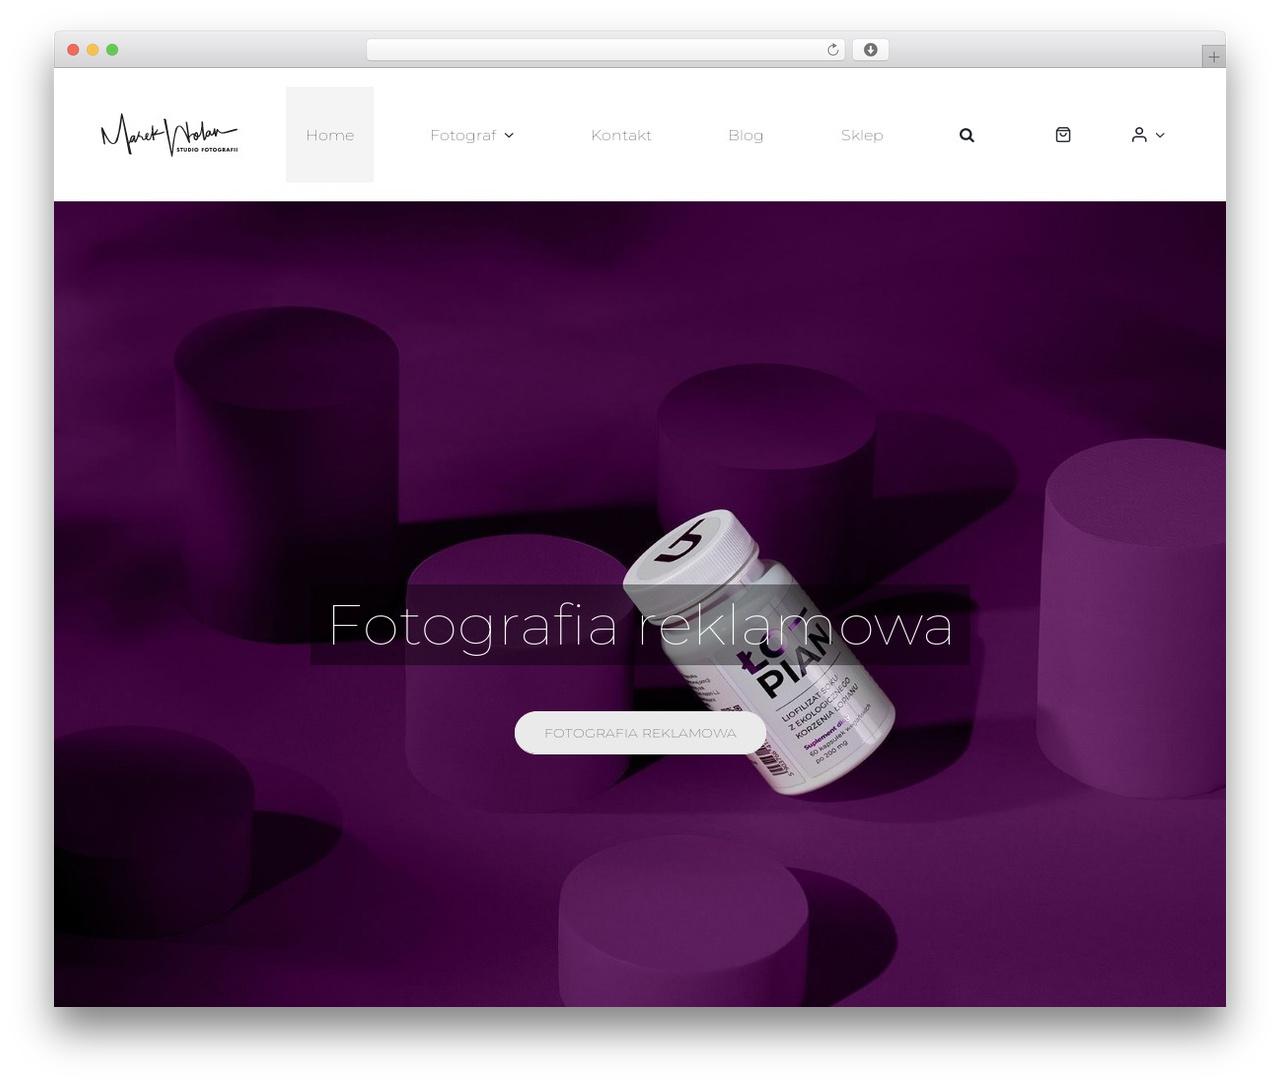 Avada Wordpress Theme By Themefusion Marekwolancom